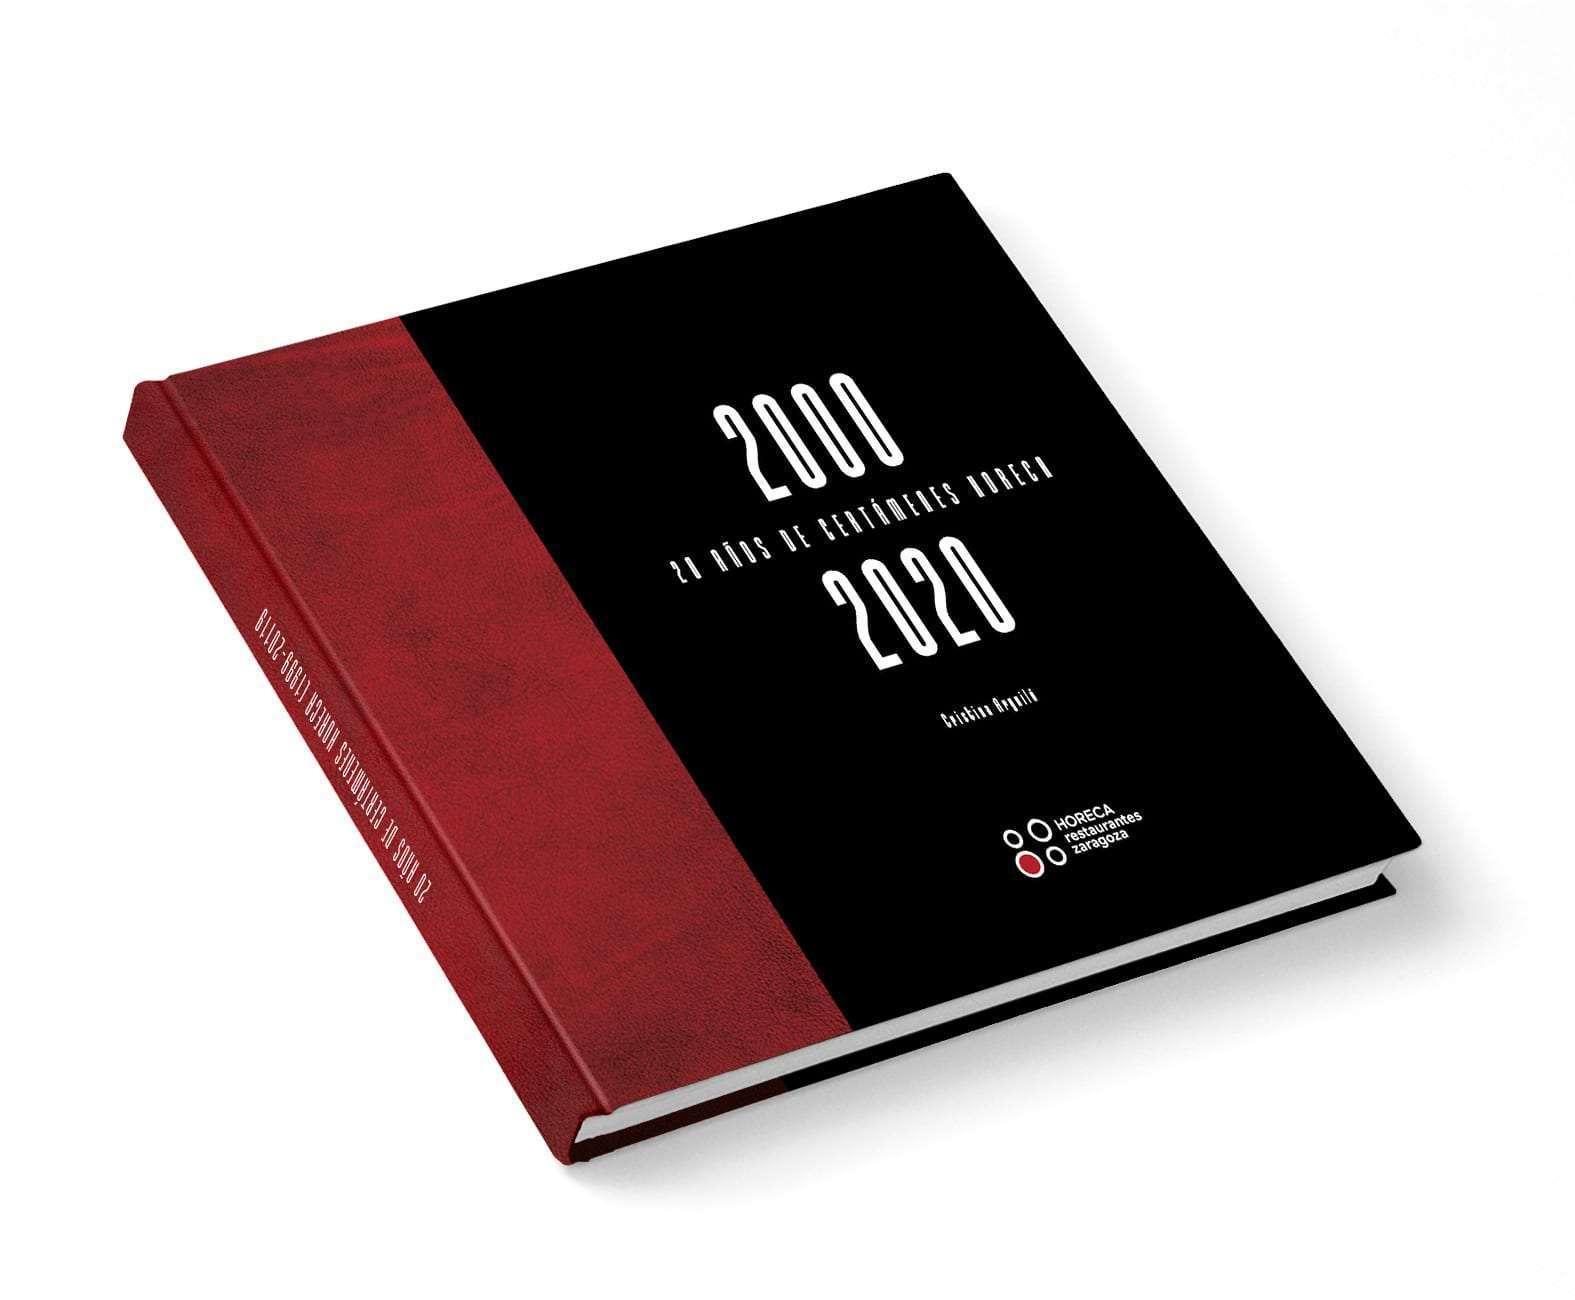 Libro aniversario de Horeca